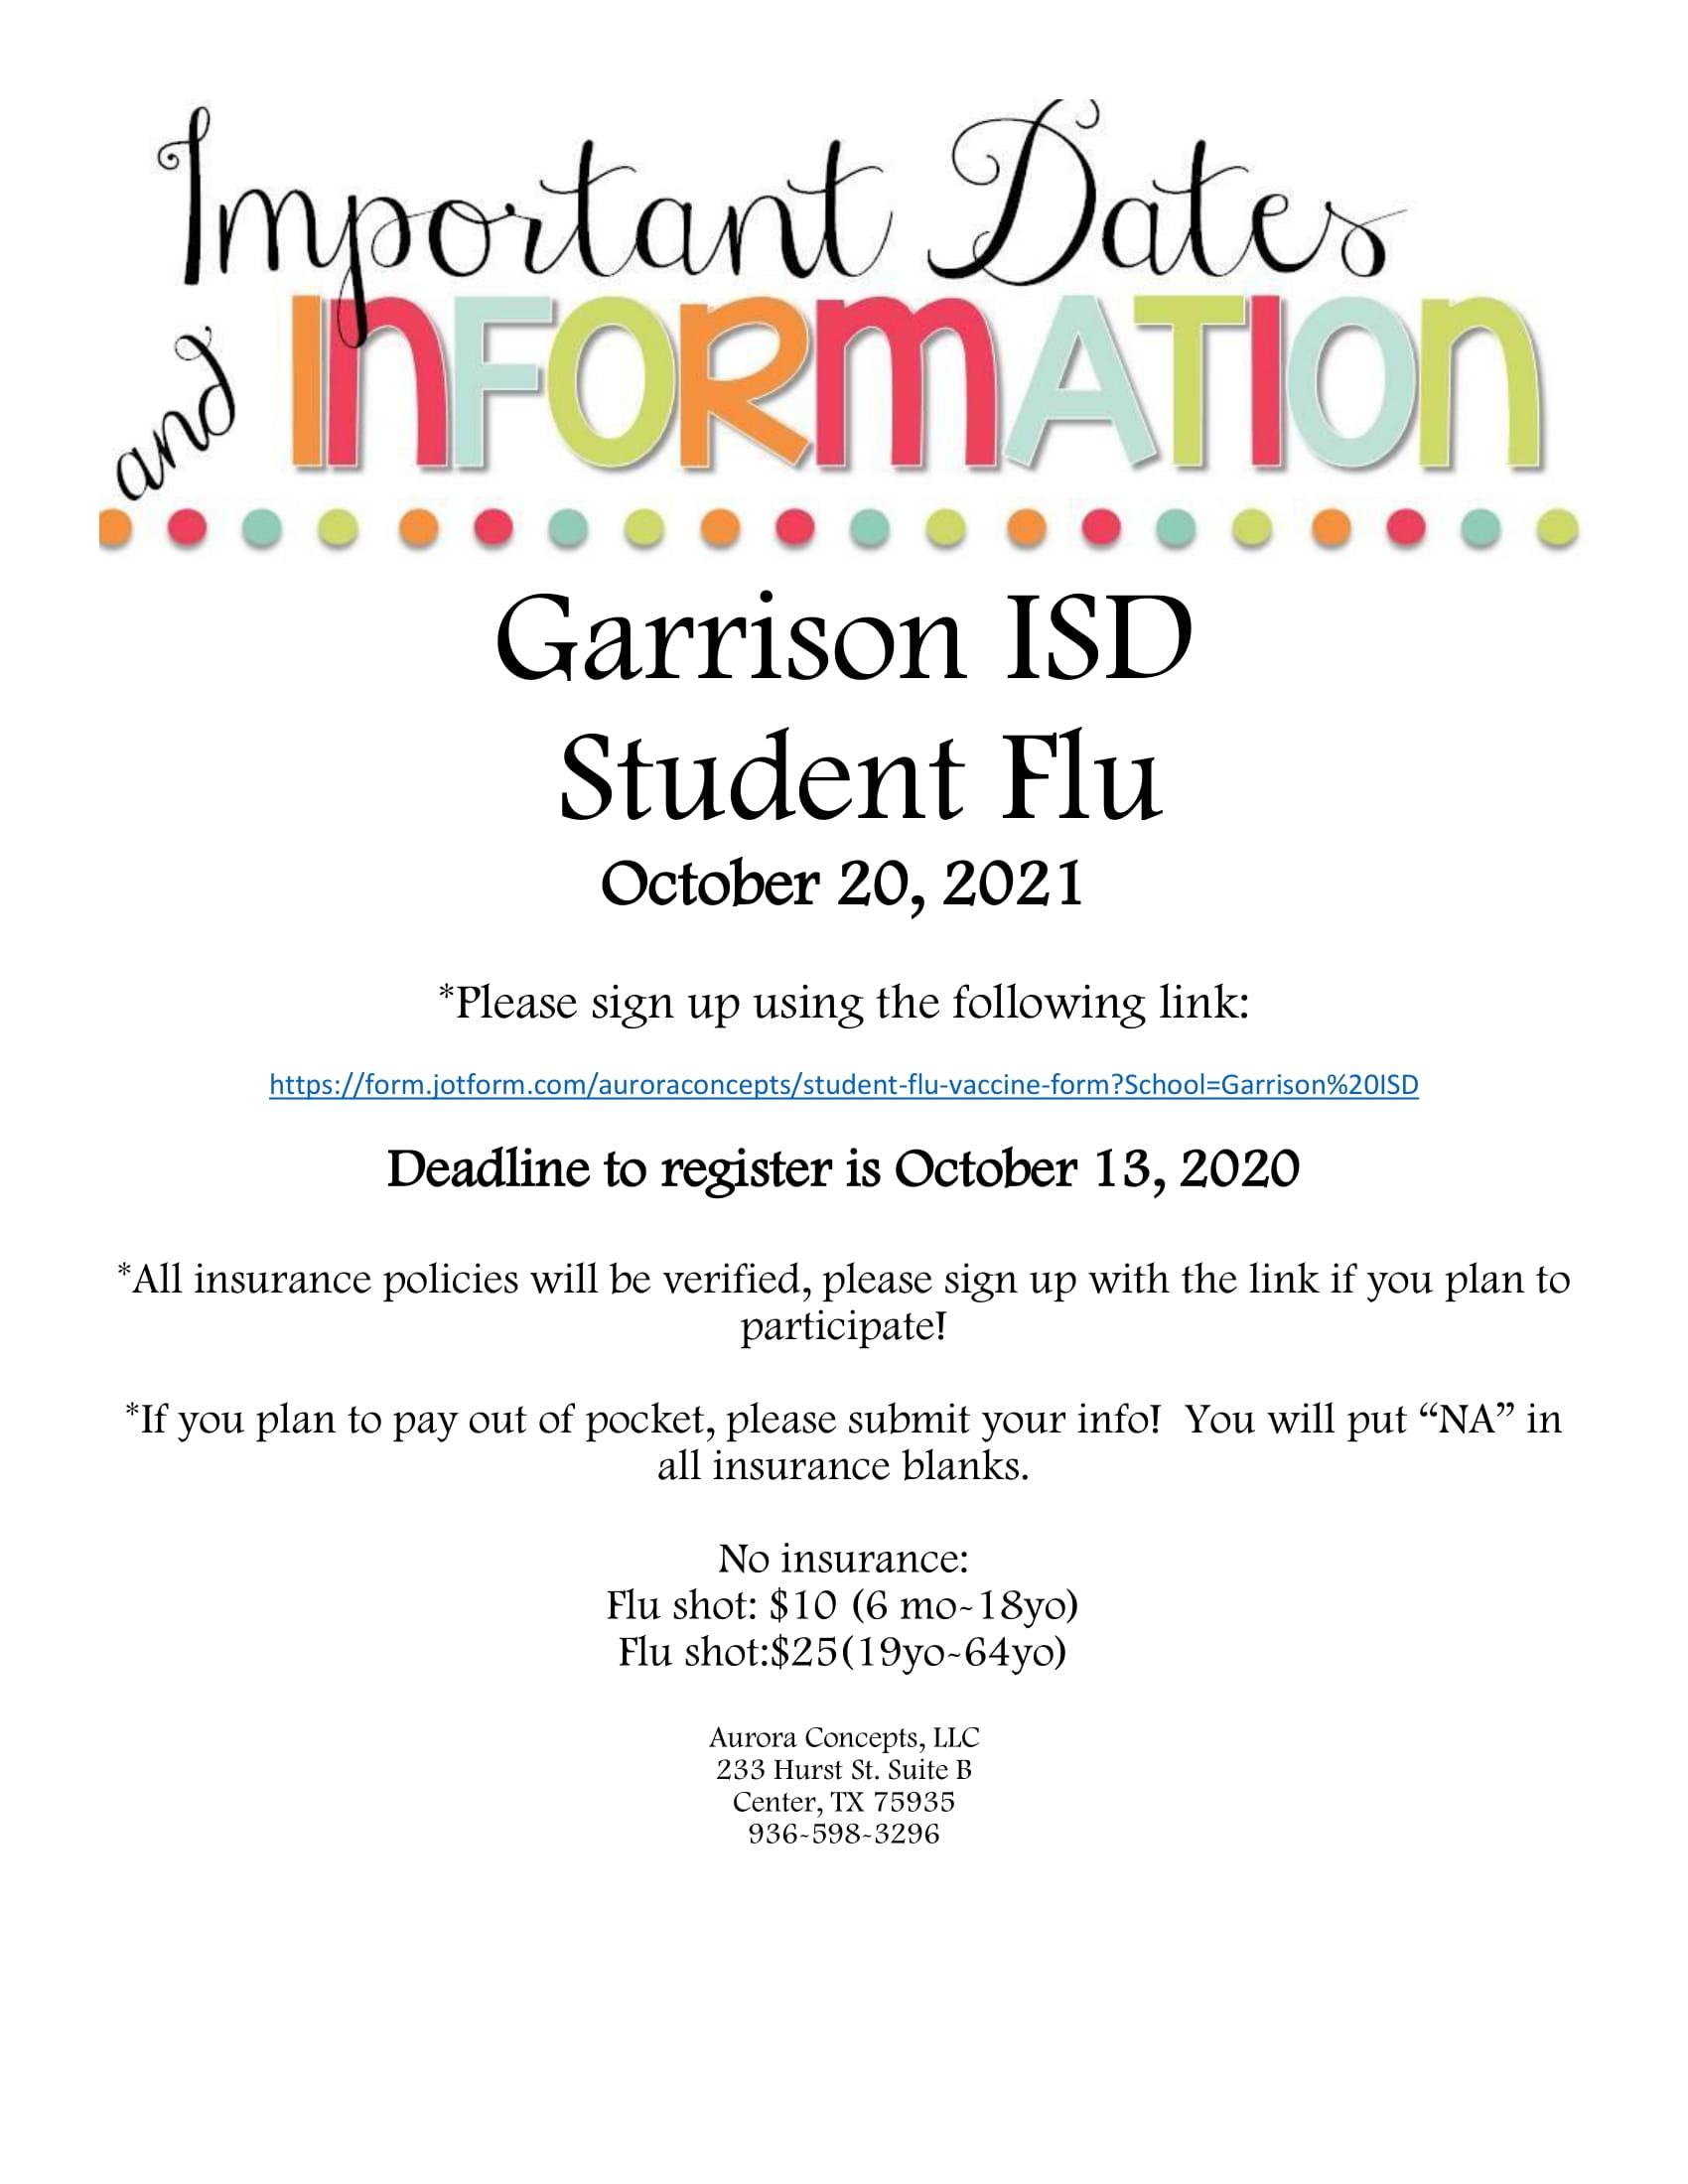 Student Flu flyer